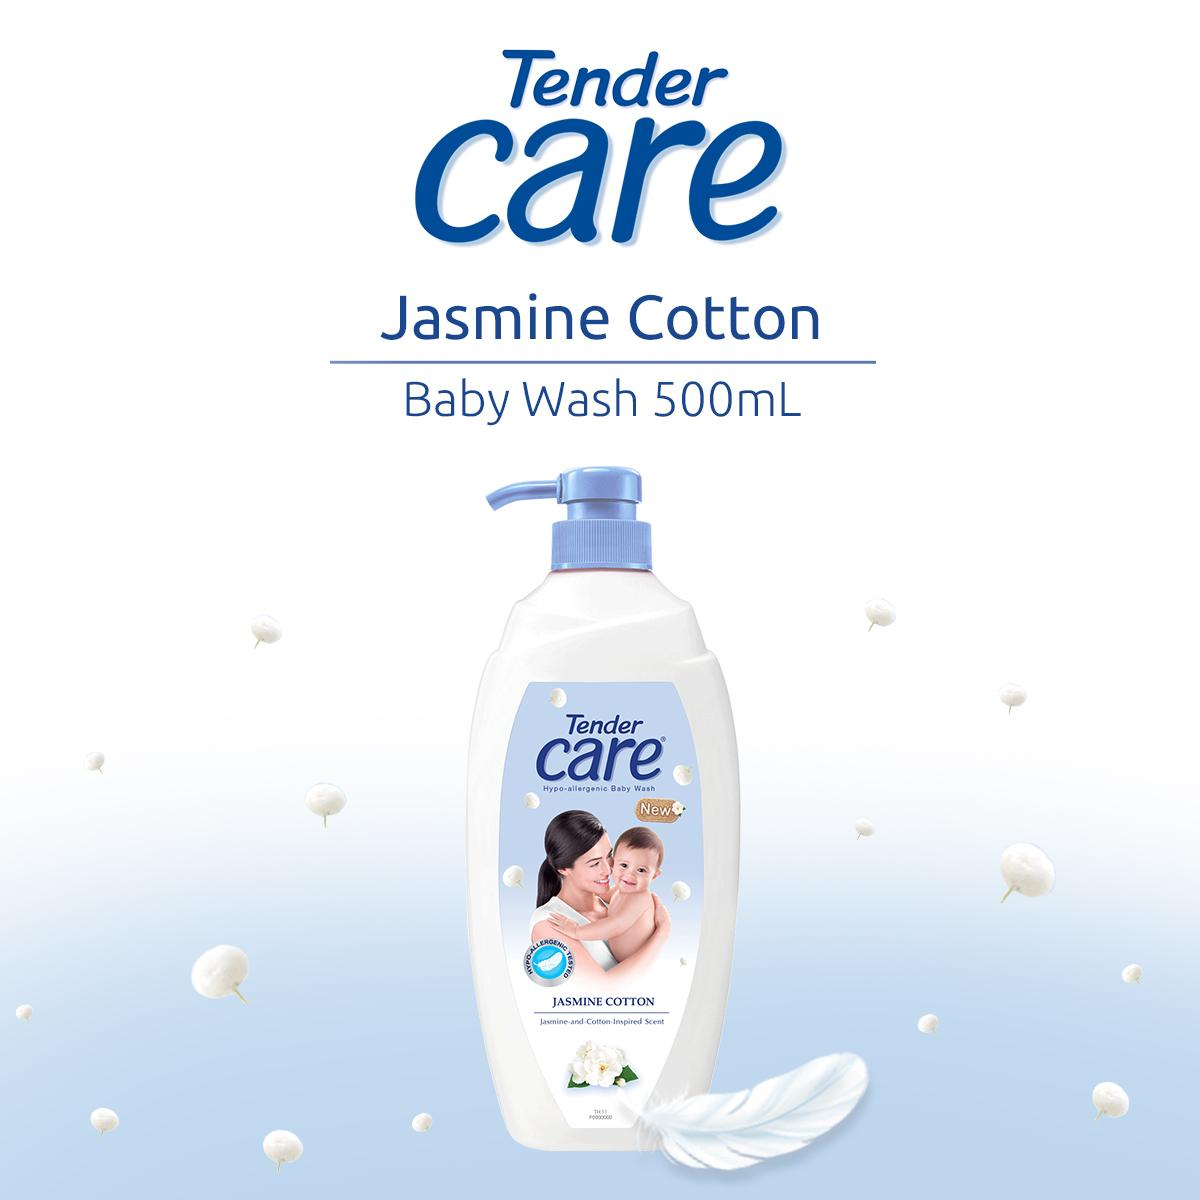 Tender Care Jasmine Cotton Hypo-Allergenic Baby Wash 500ml By Lazada Retail Tender Care.